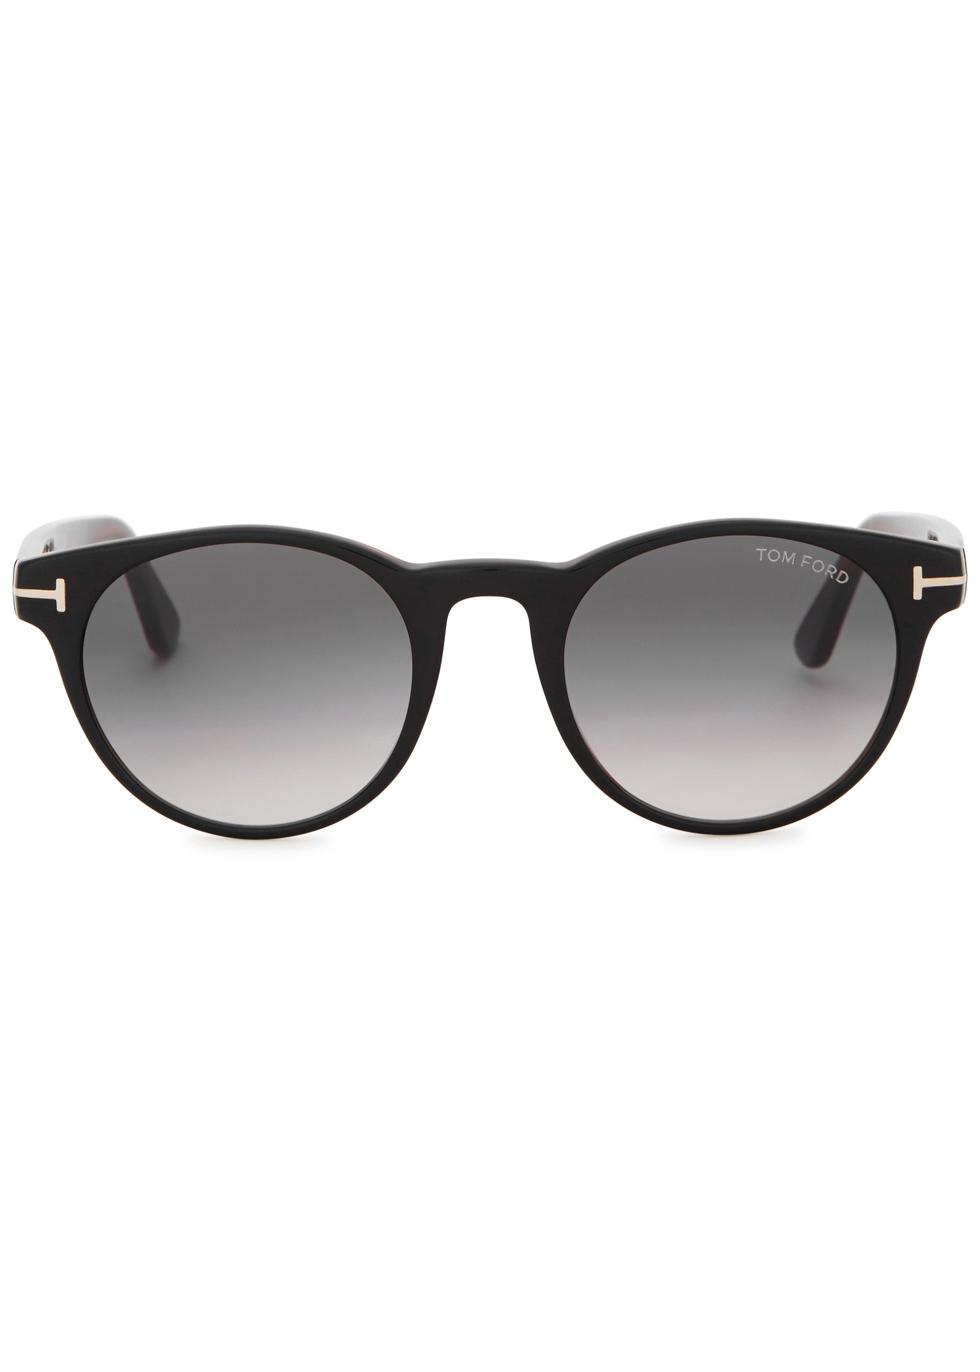 Palmer black round-frame sunglasses - Tom Ford Eyewear